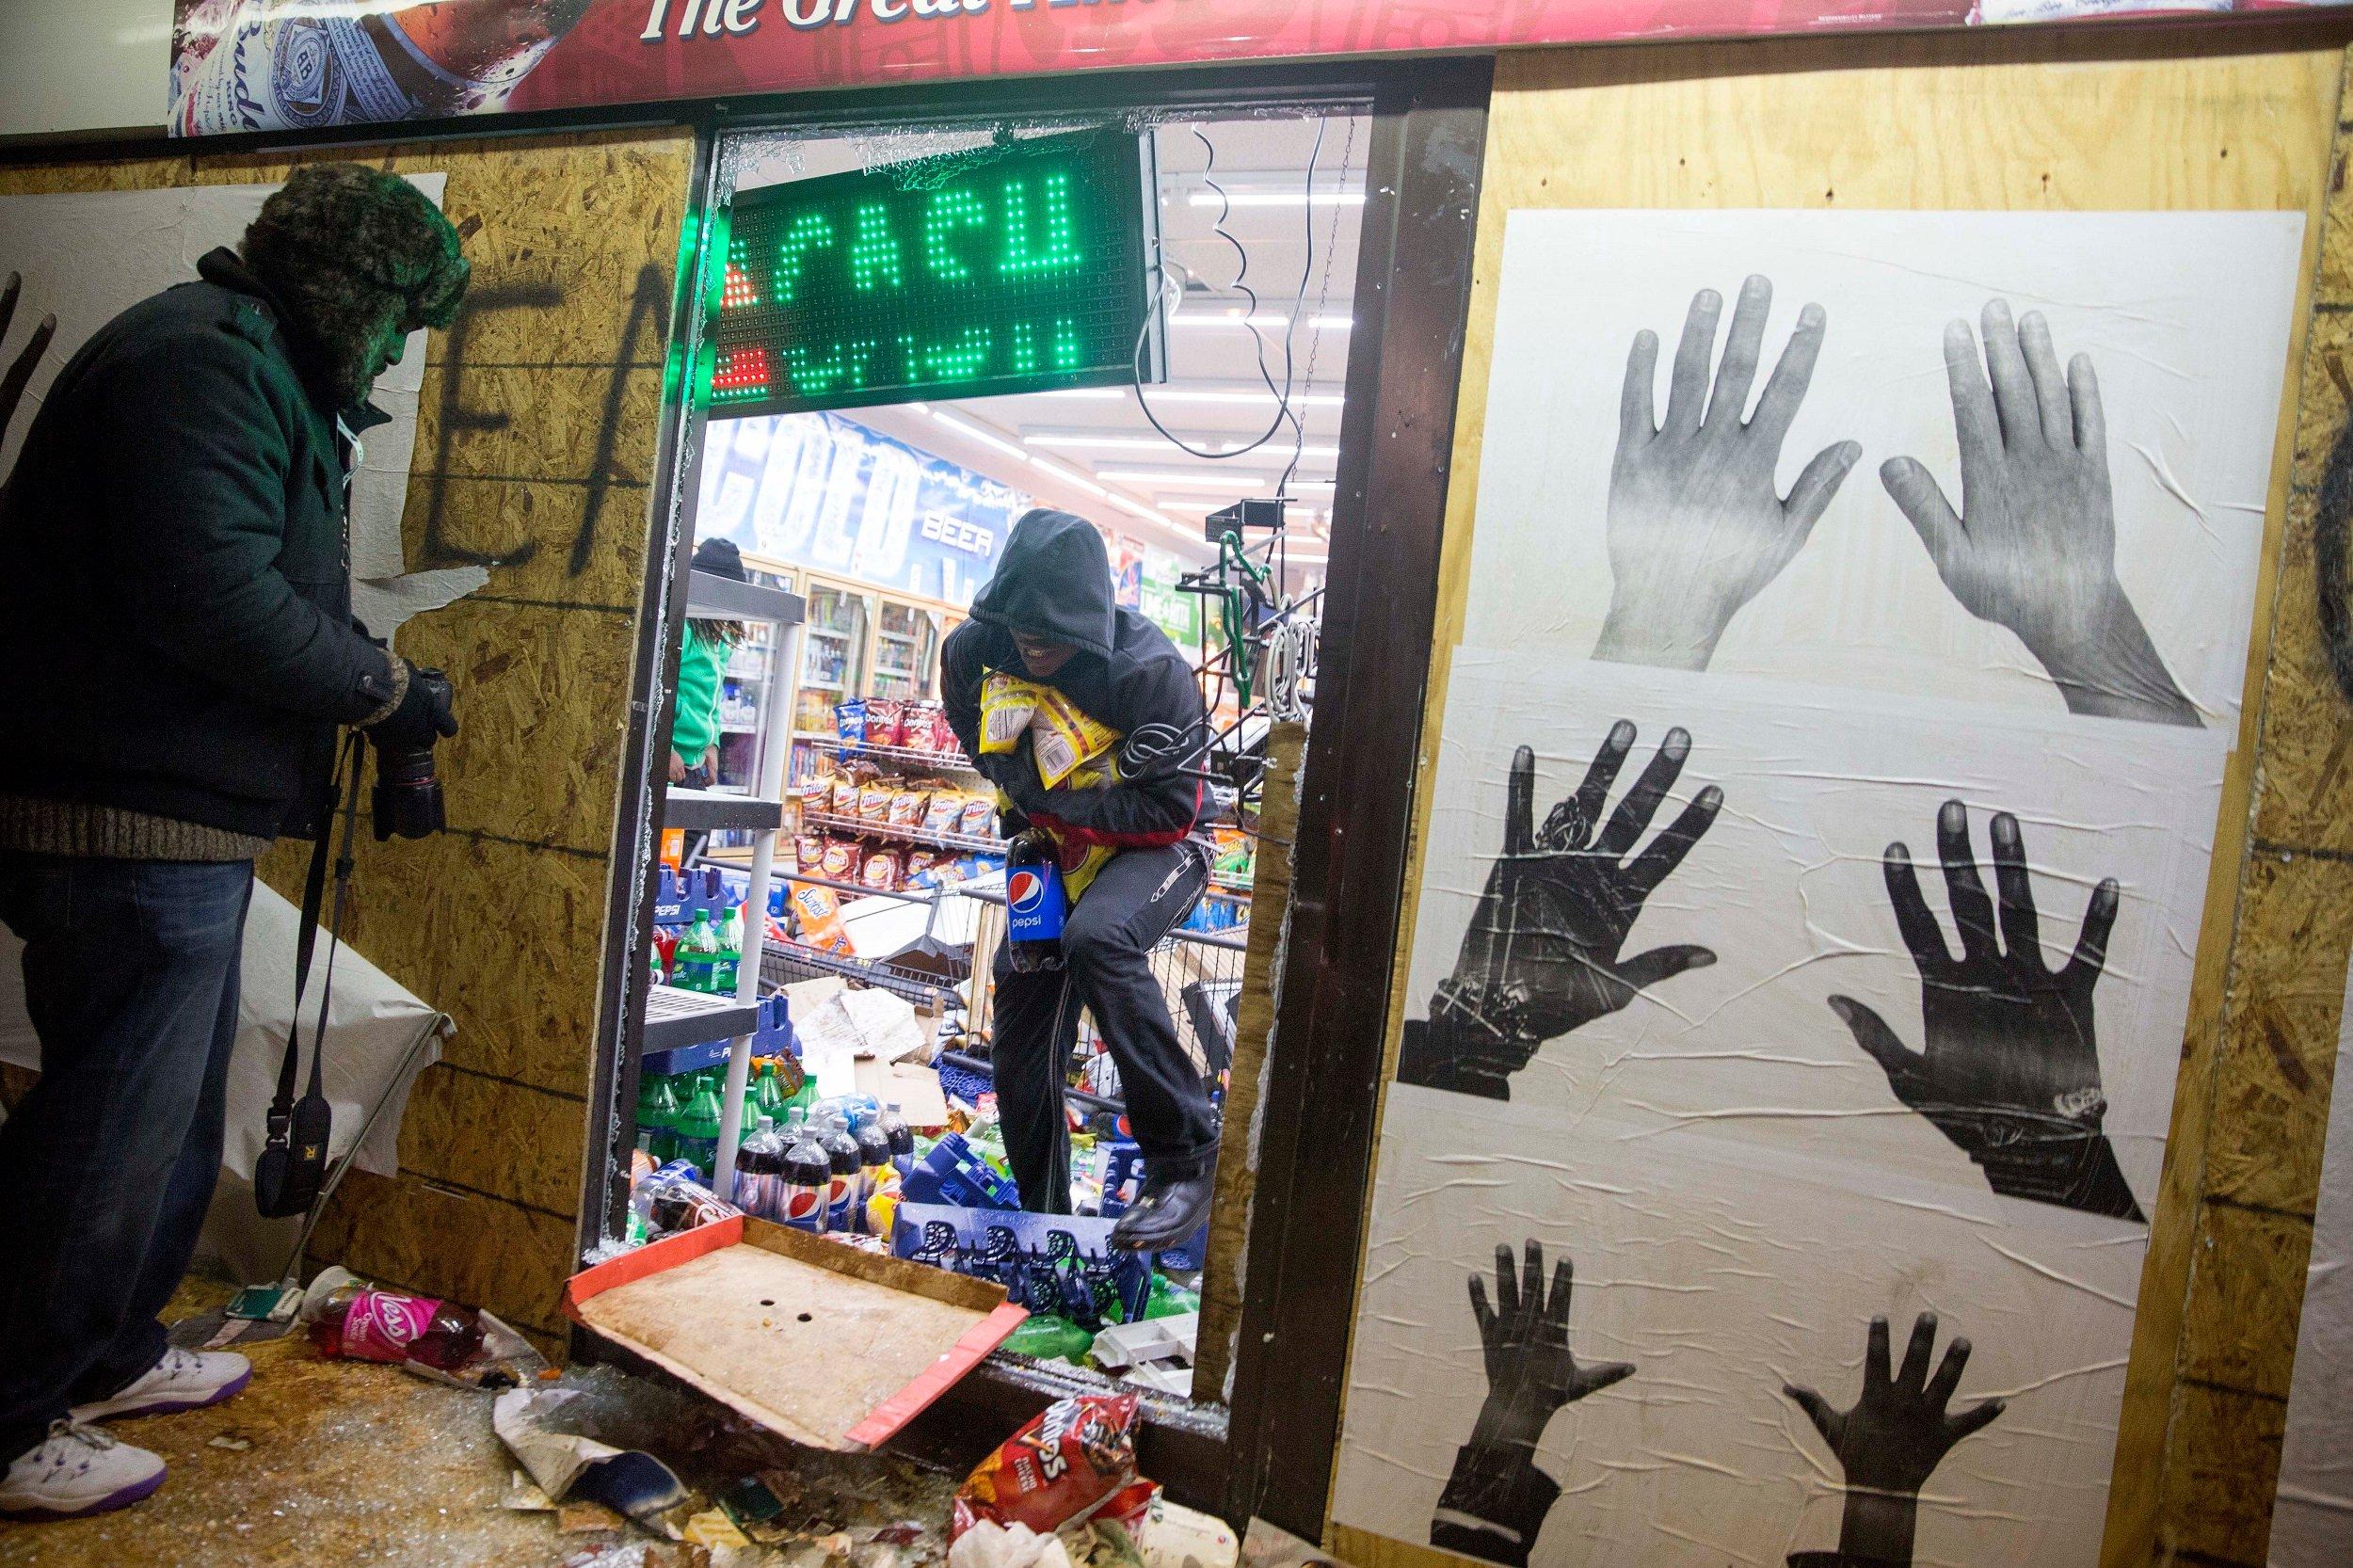 Ferguson Getty Images /Aaron P. Bernstein